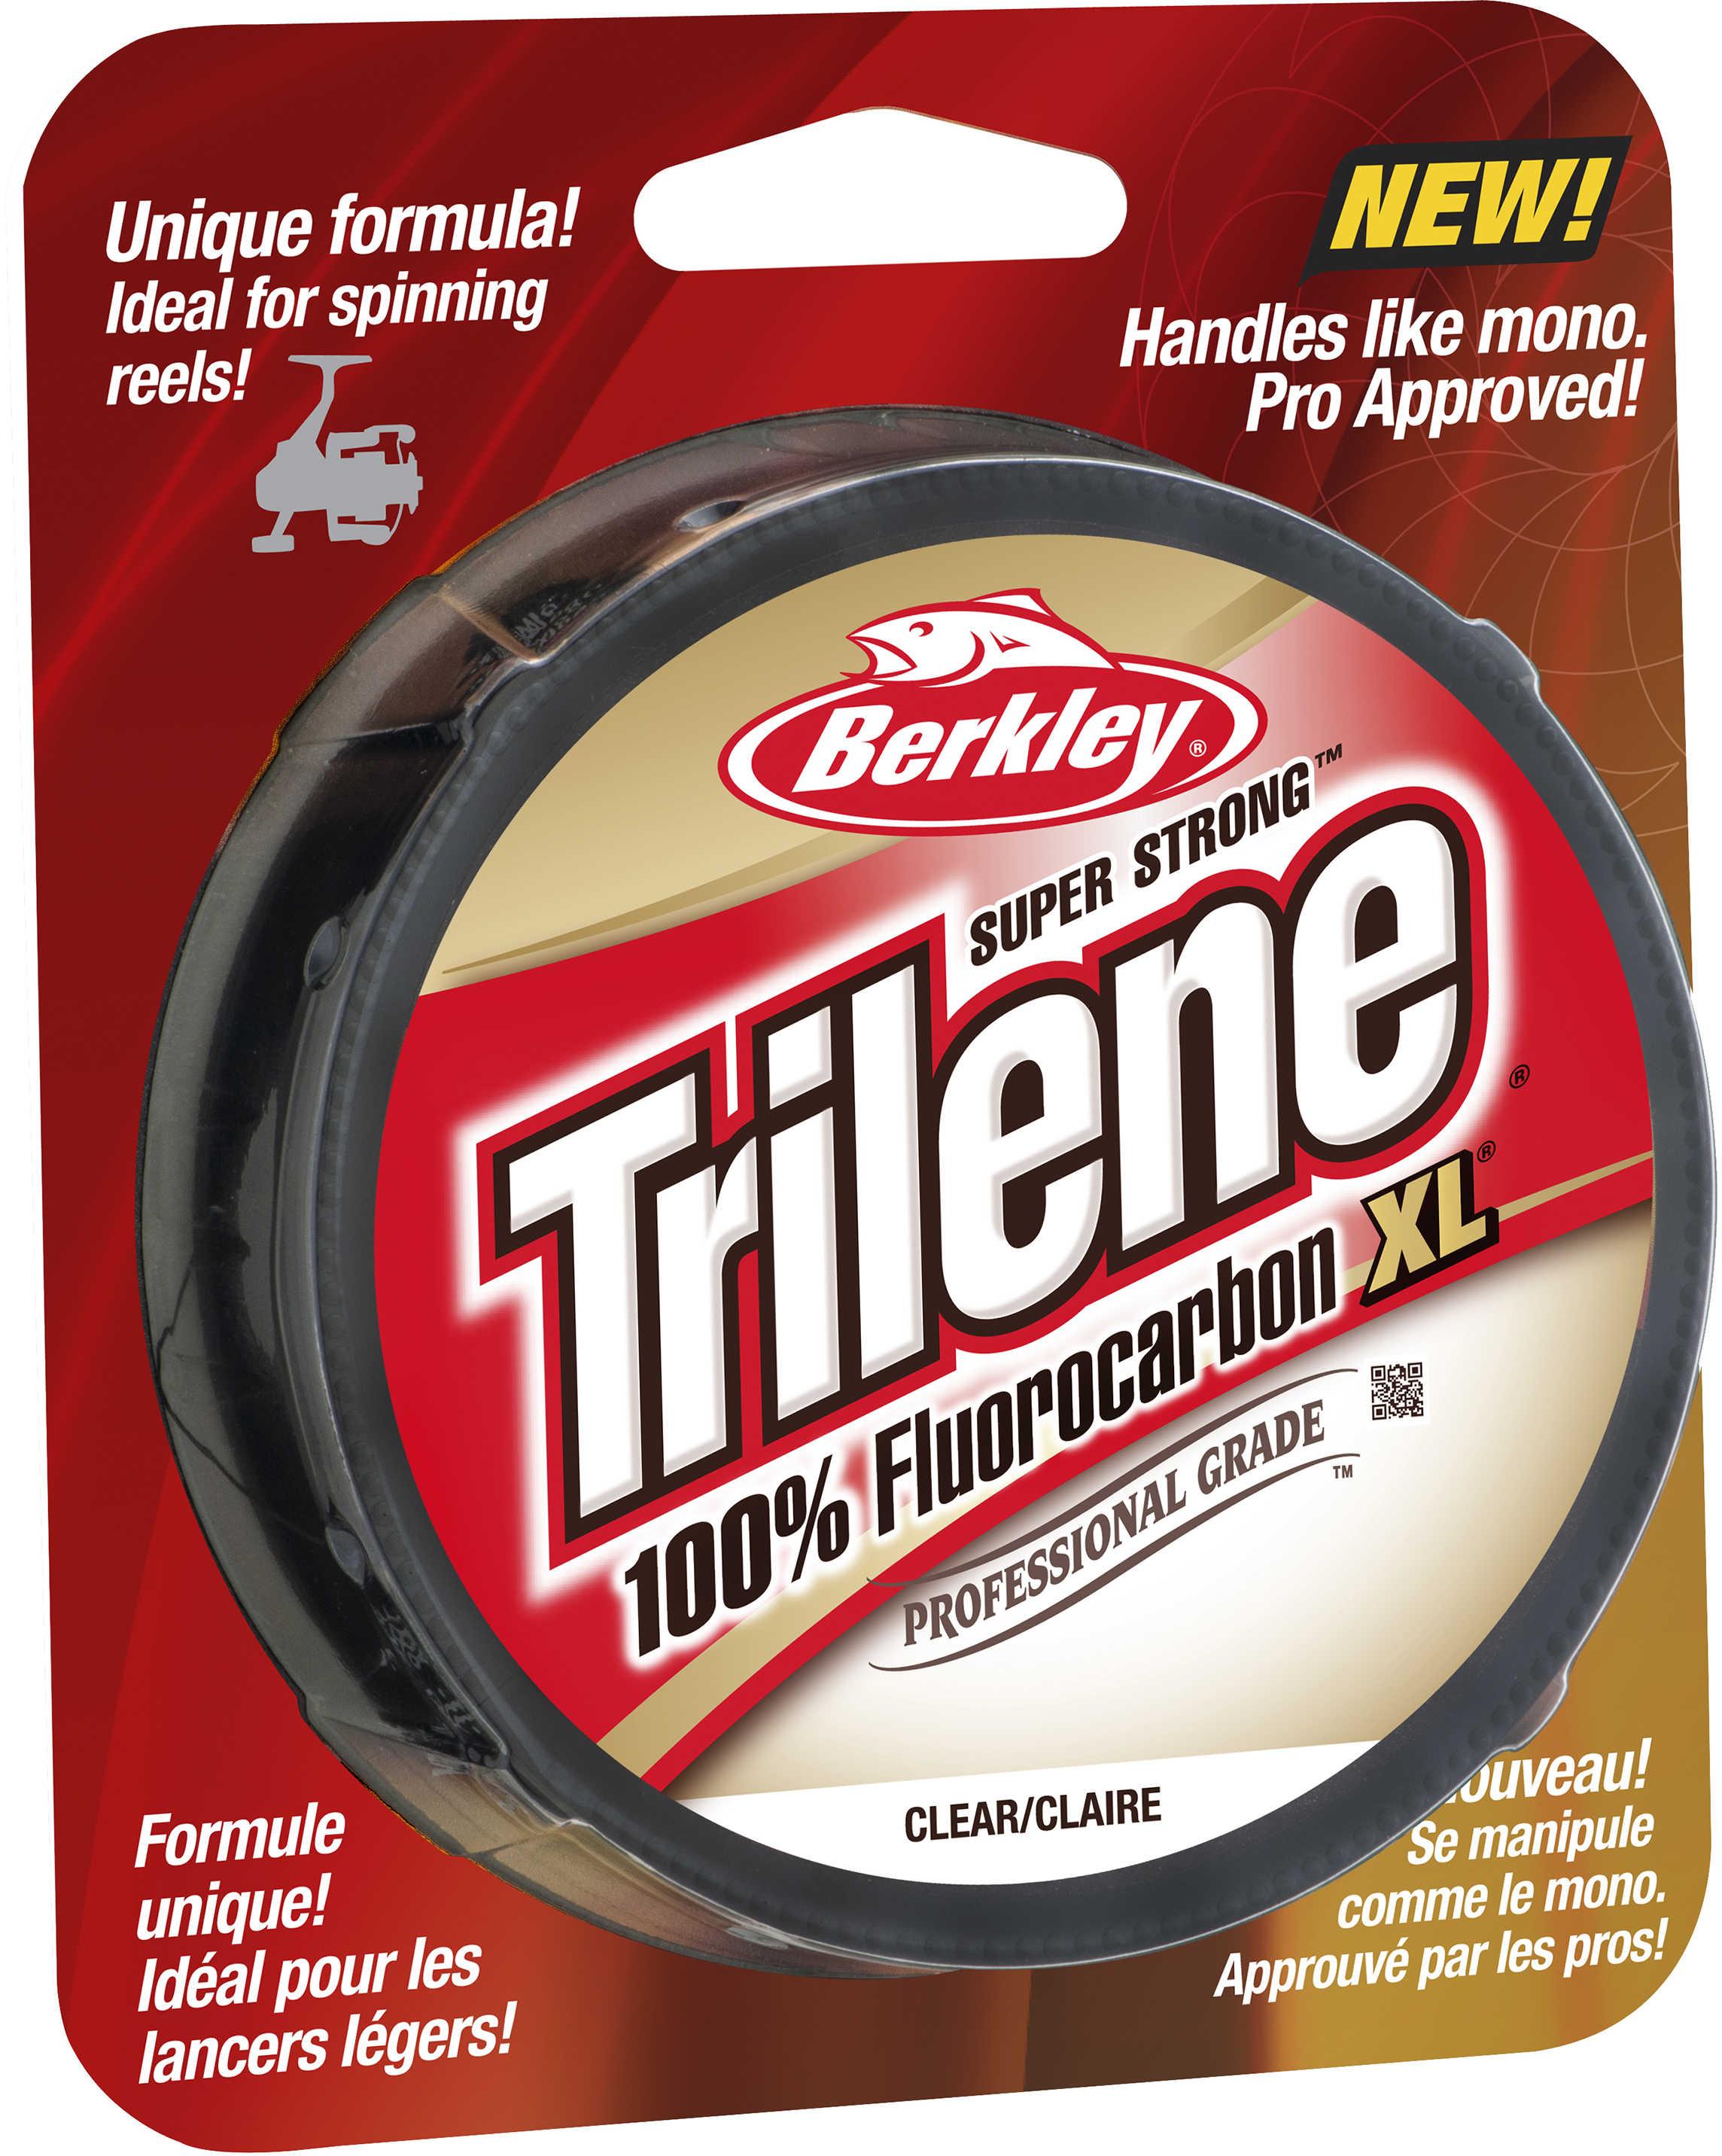 Berkley Trilene Fluorocarbon XL Professional Grade Filler Spool 6 lb, 200 Yards , Clear Md: 1291906